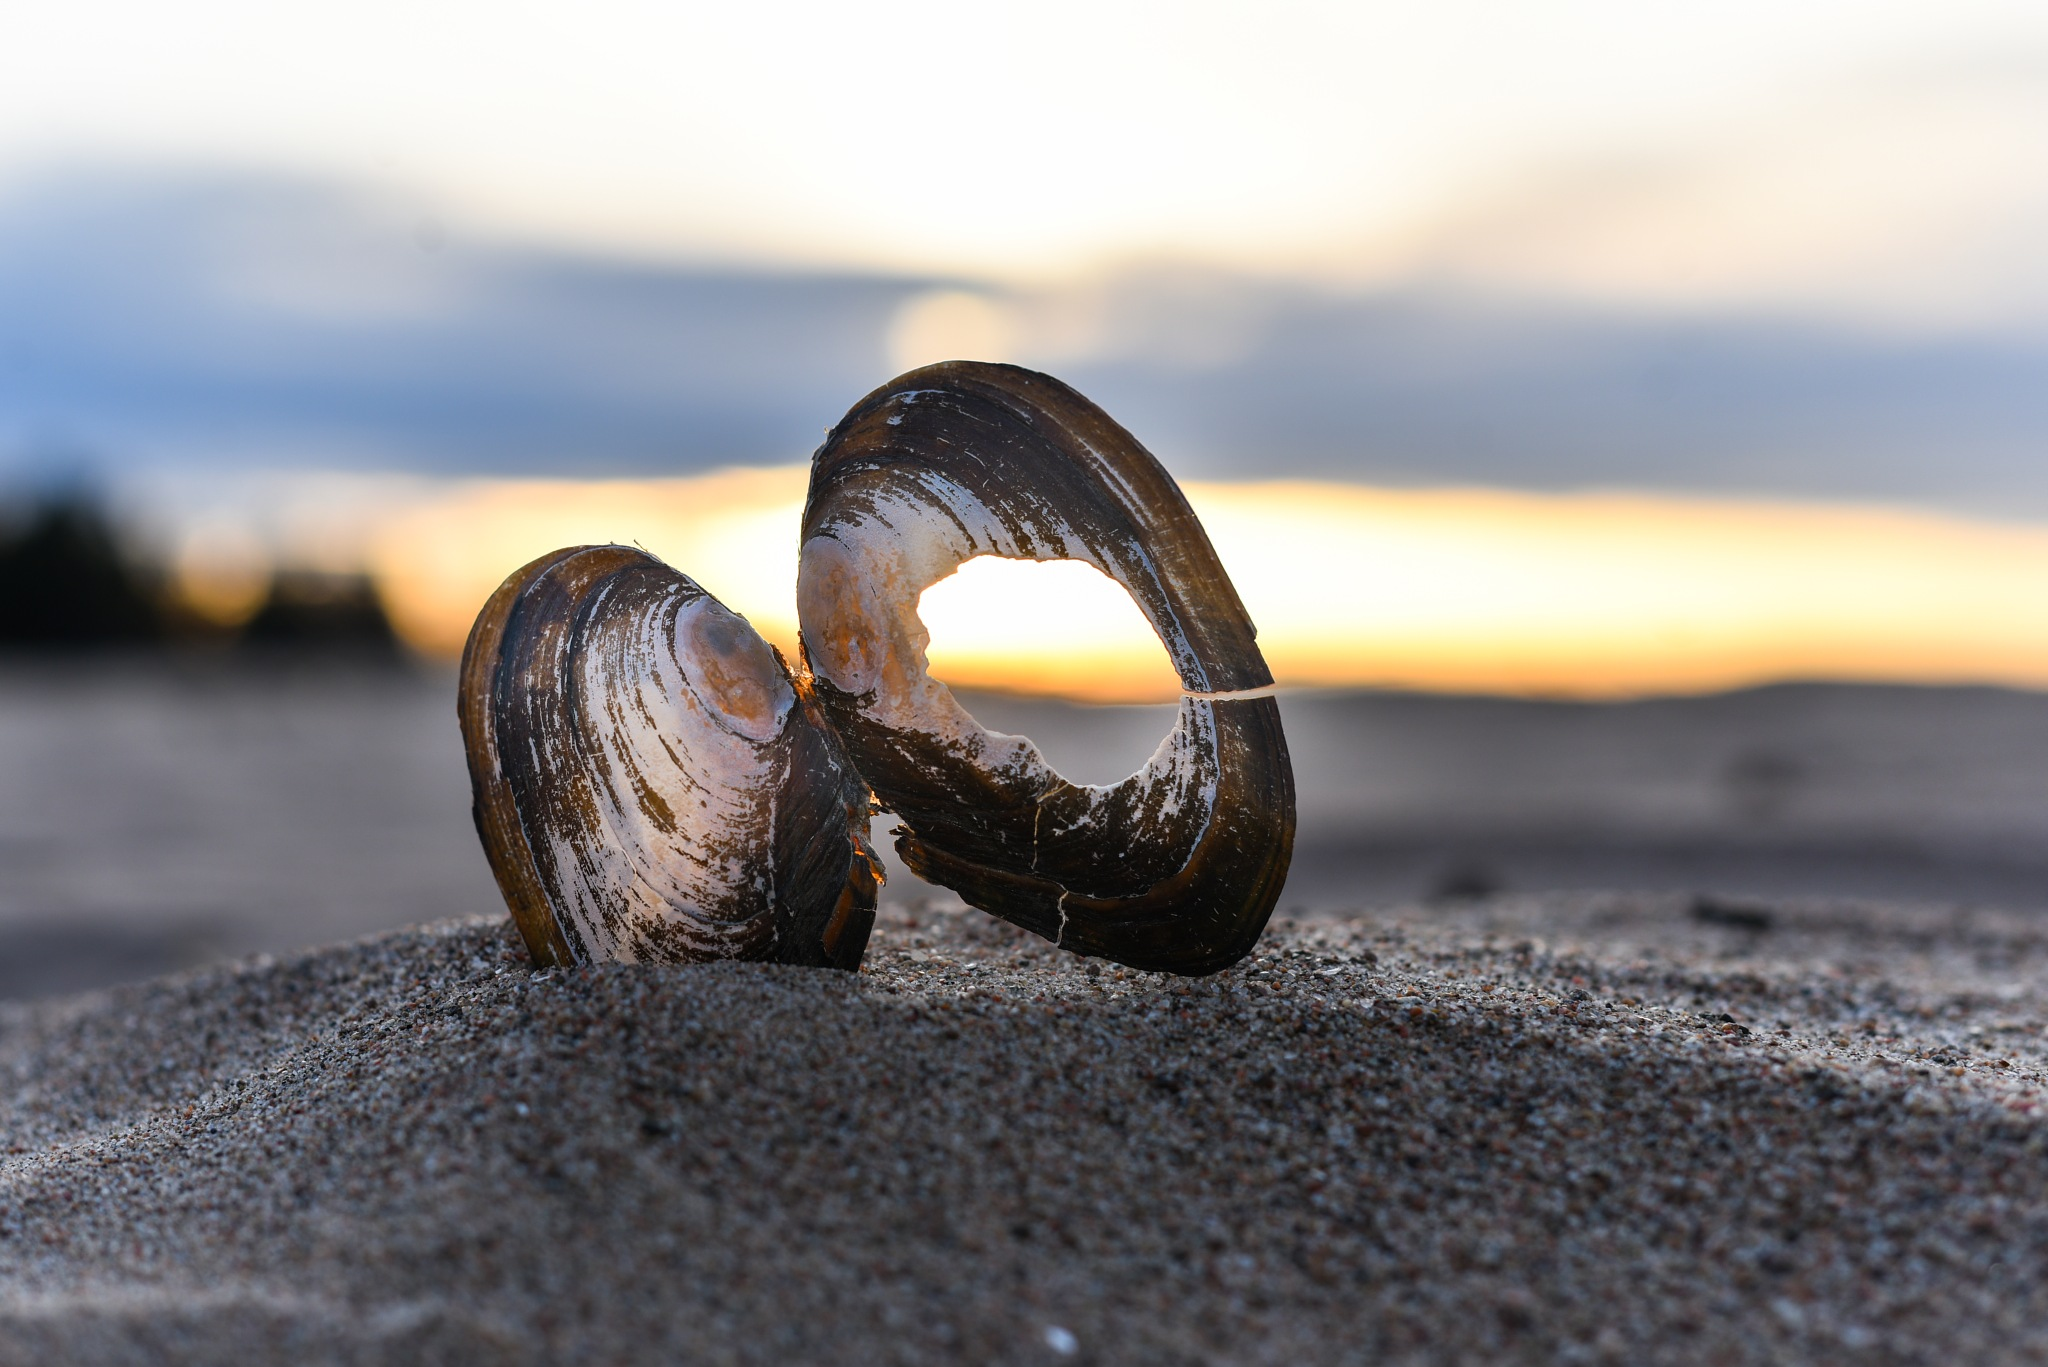 seashell by Niclaskrog